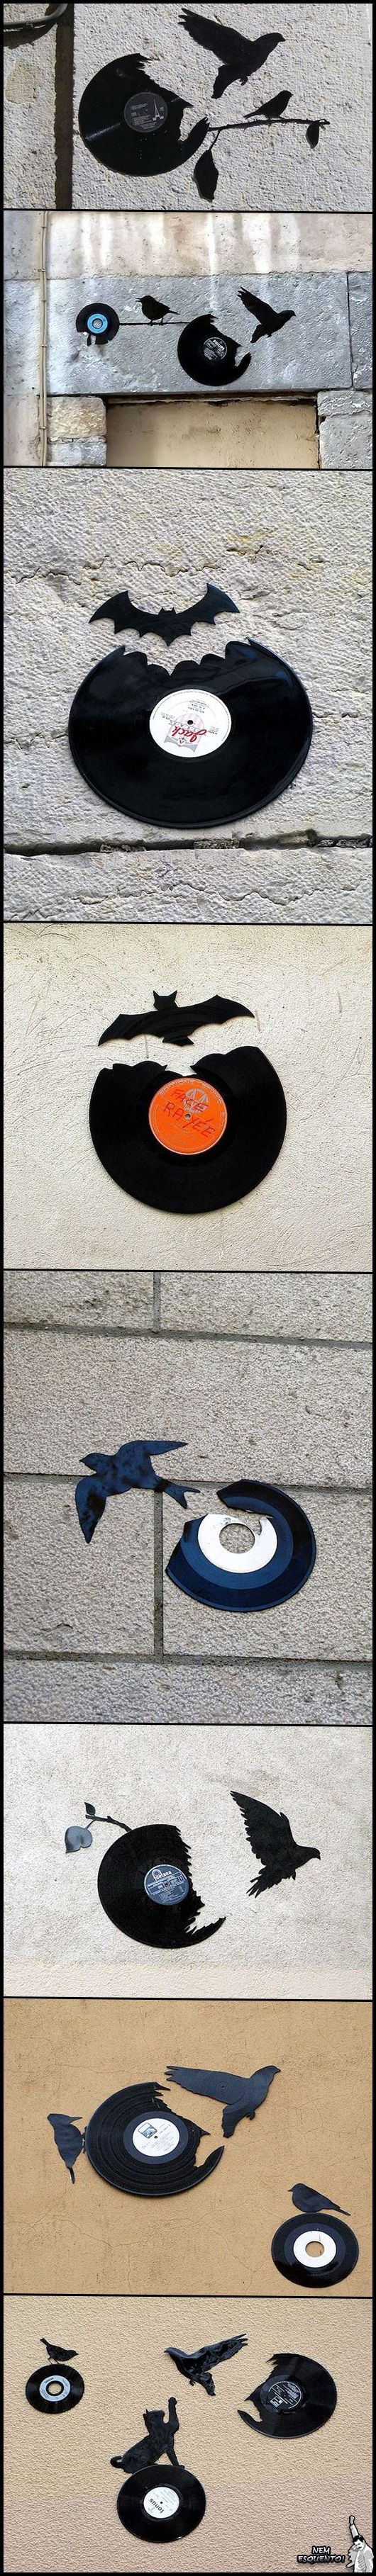 Arte em disco de vinil  @Fellow Fellow Dalgliesh (Fellow Fellow) Macleod